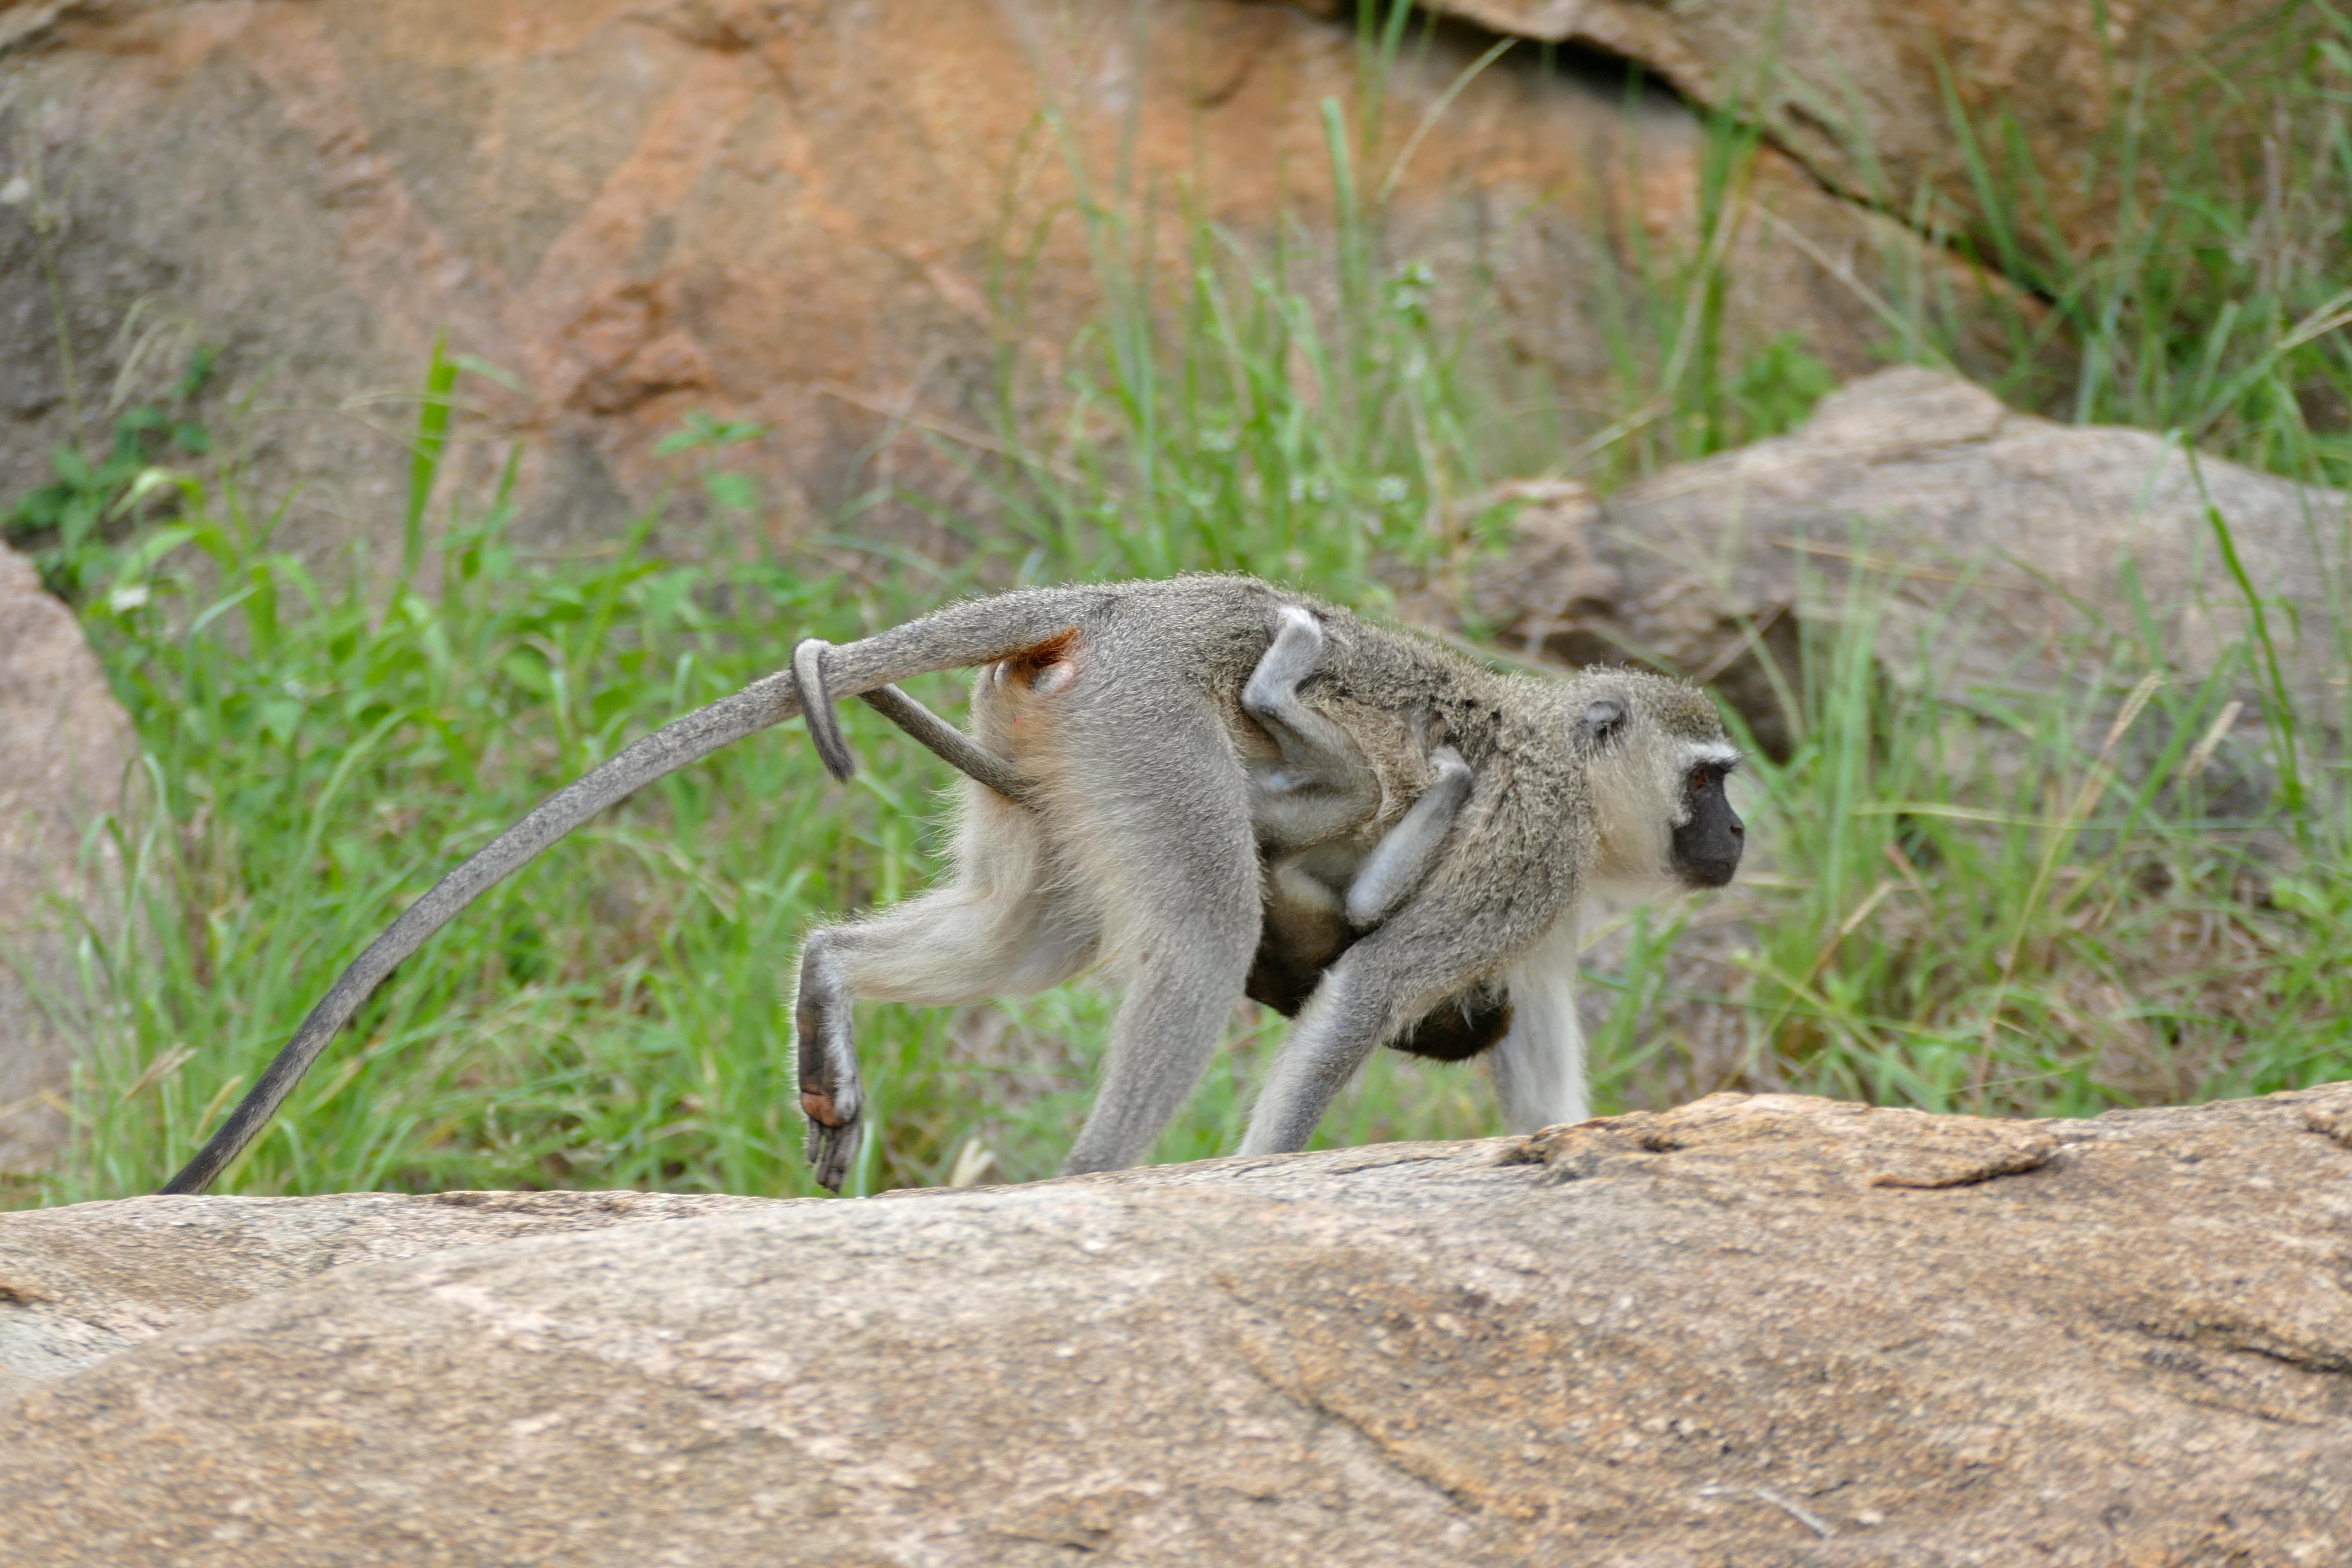 Image of vervet monkey